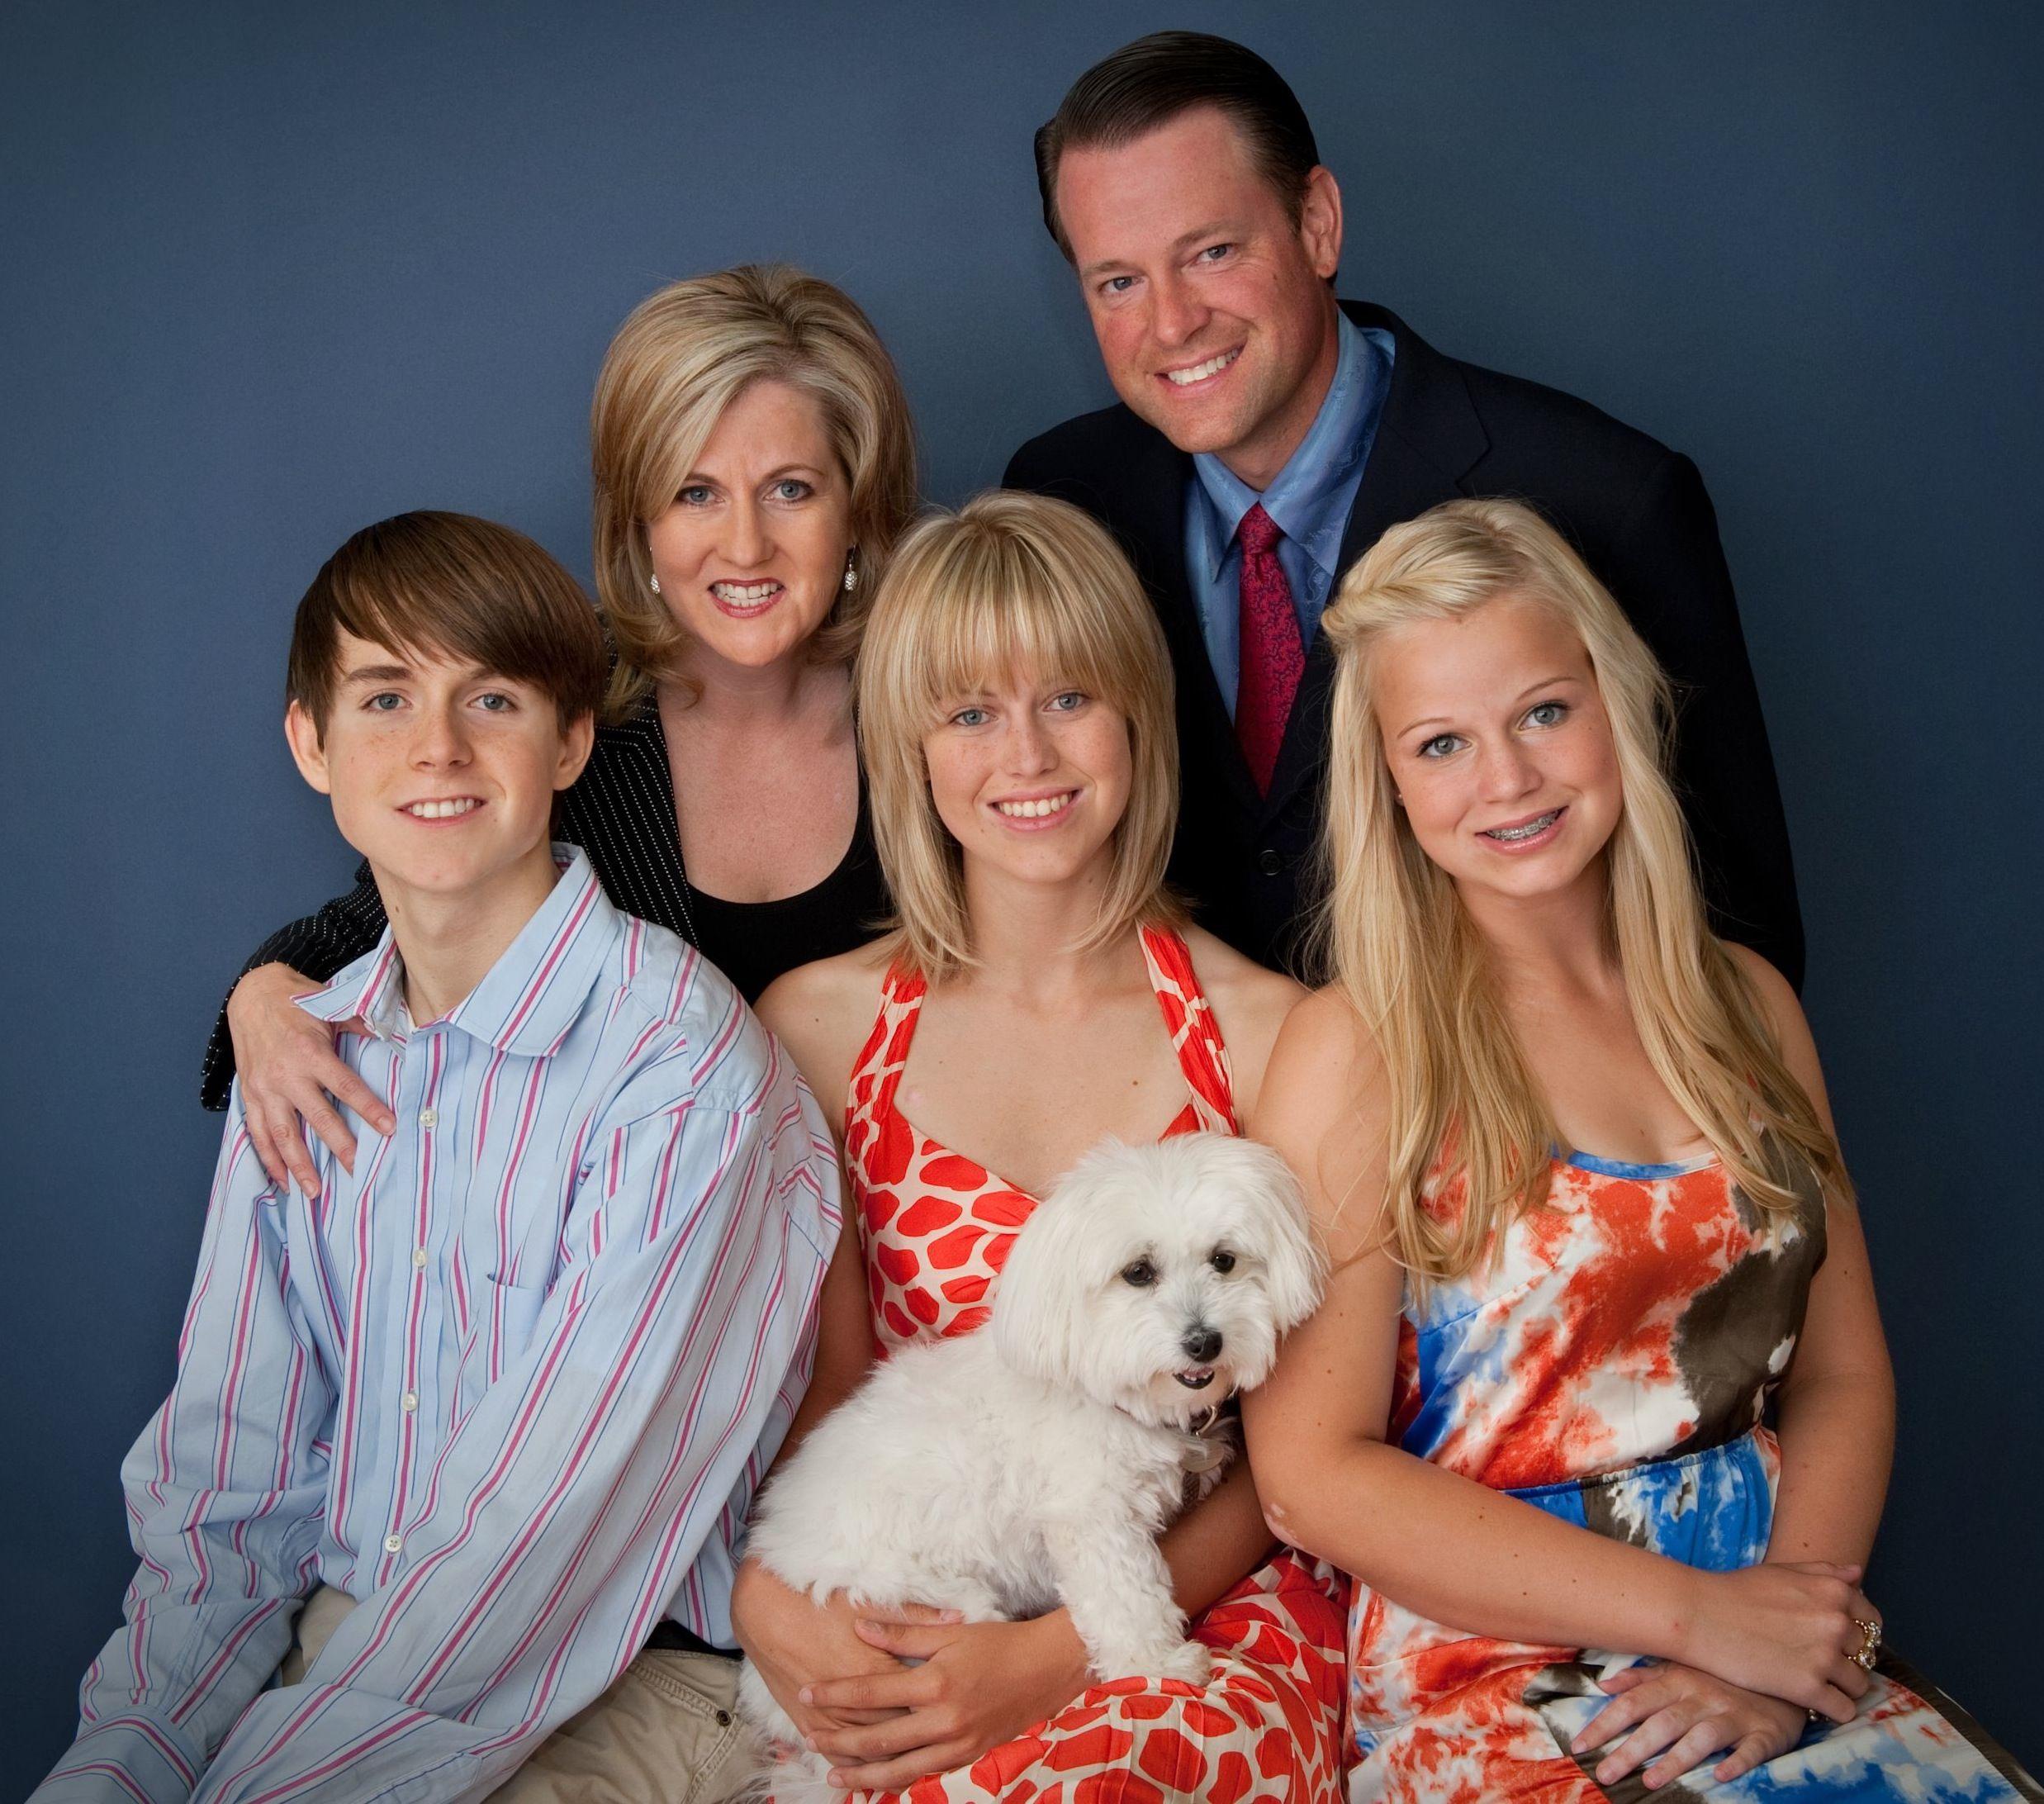 Family Photo Ideas Pinterest: Joy Studio Design Gallery - Best Design